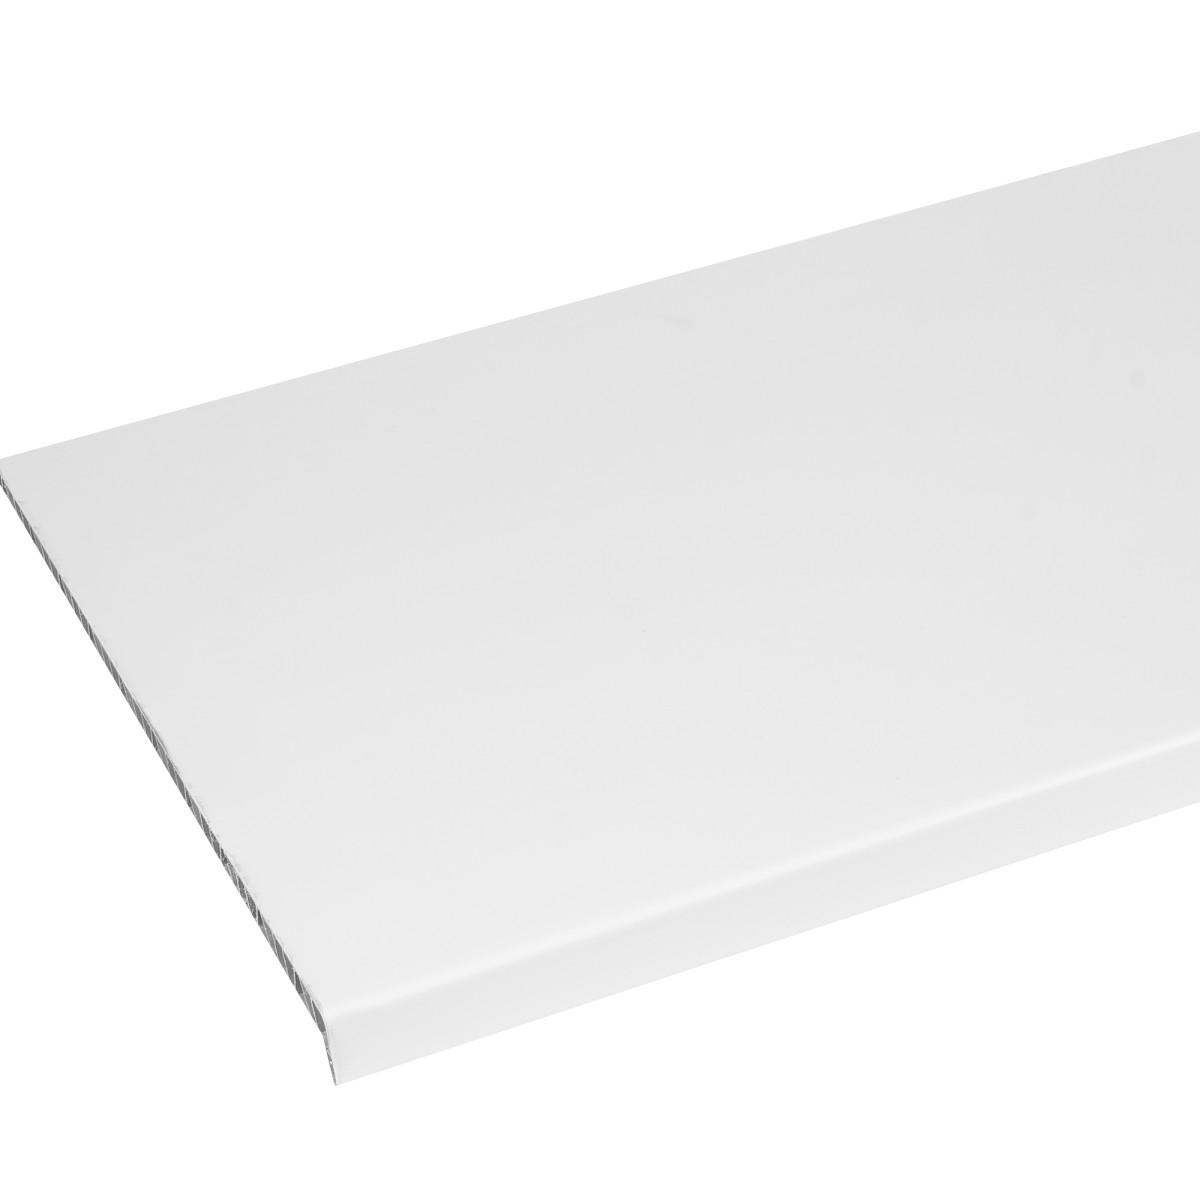 Подоконник ПВХ 400x1500 мм цвет белый